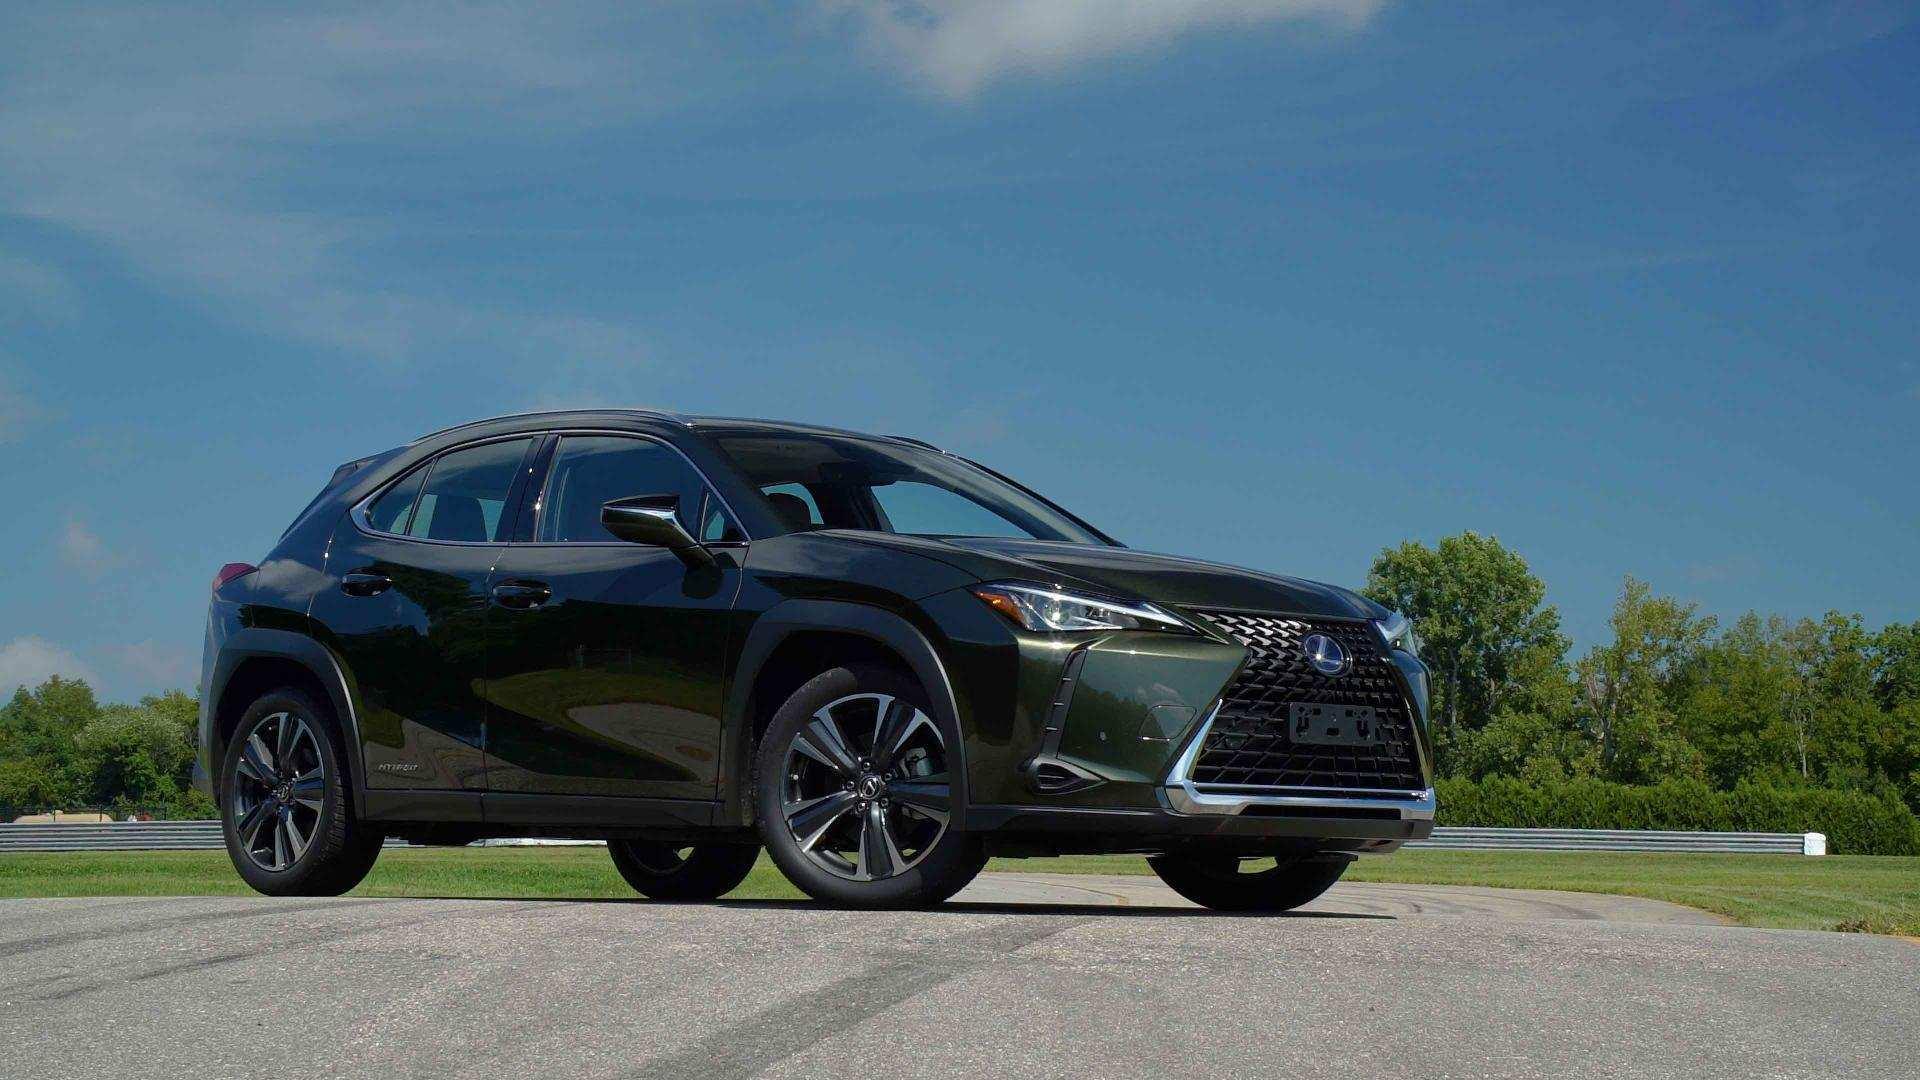 83 The Lexus Plug In Hybrid 2020 Style with Lexus Plug In Hybrid 2020